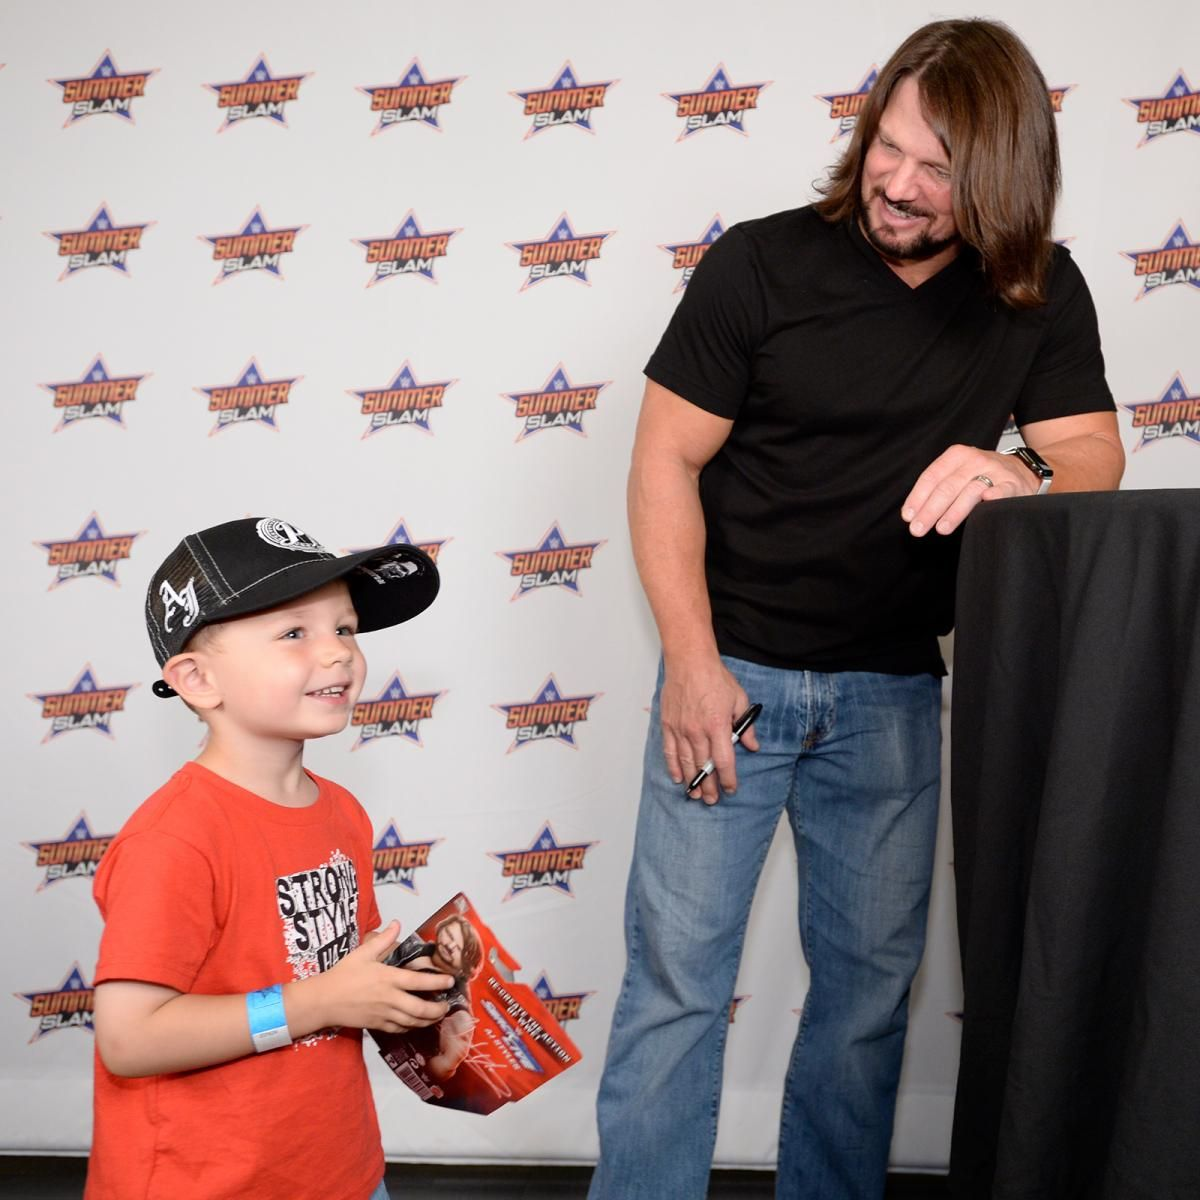 Photos Summerslam Meet Greet With Aj Styles And Dean Ambrose Aj